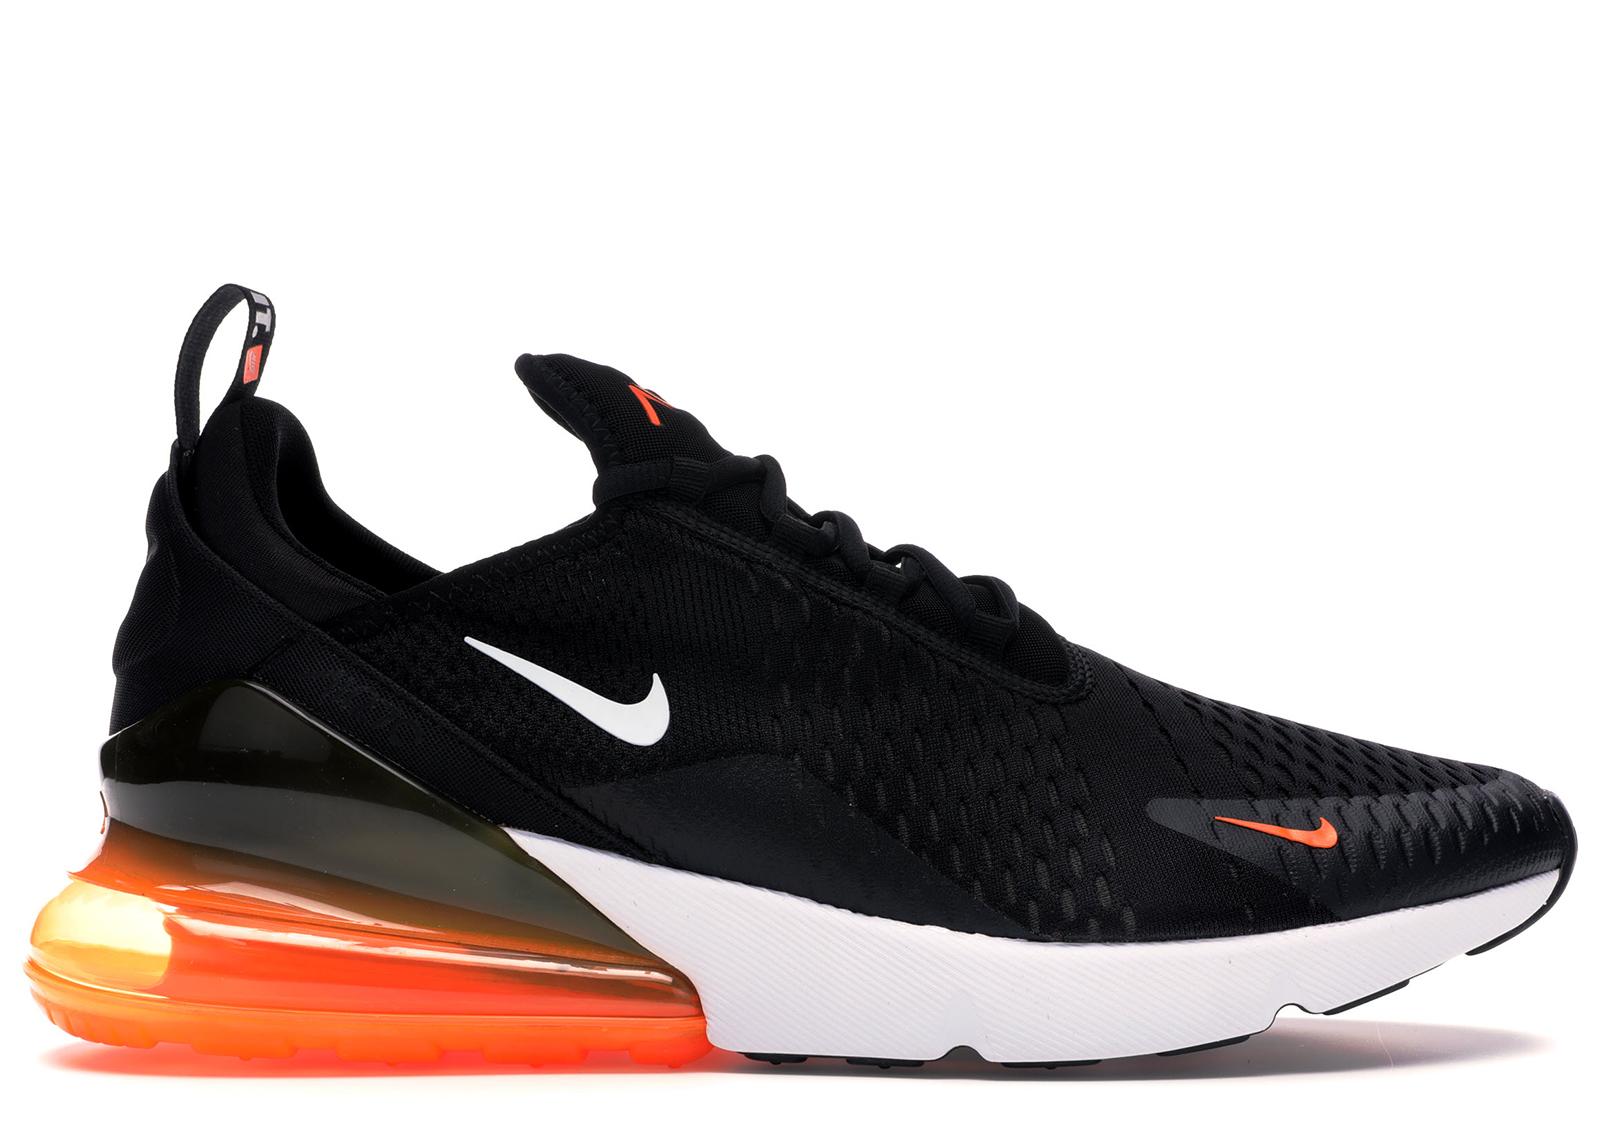 Nike Air Max 270 Black White Total Orange - AH8050-014